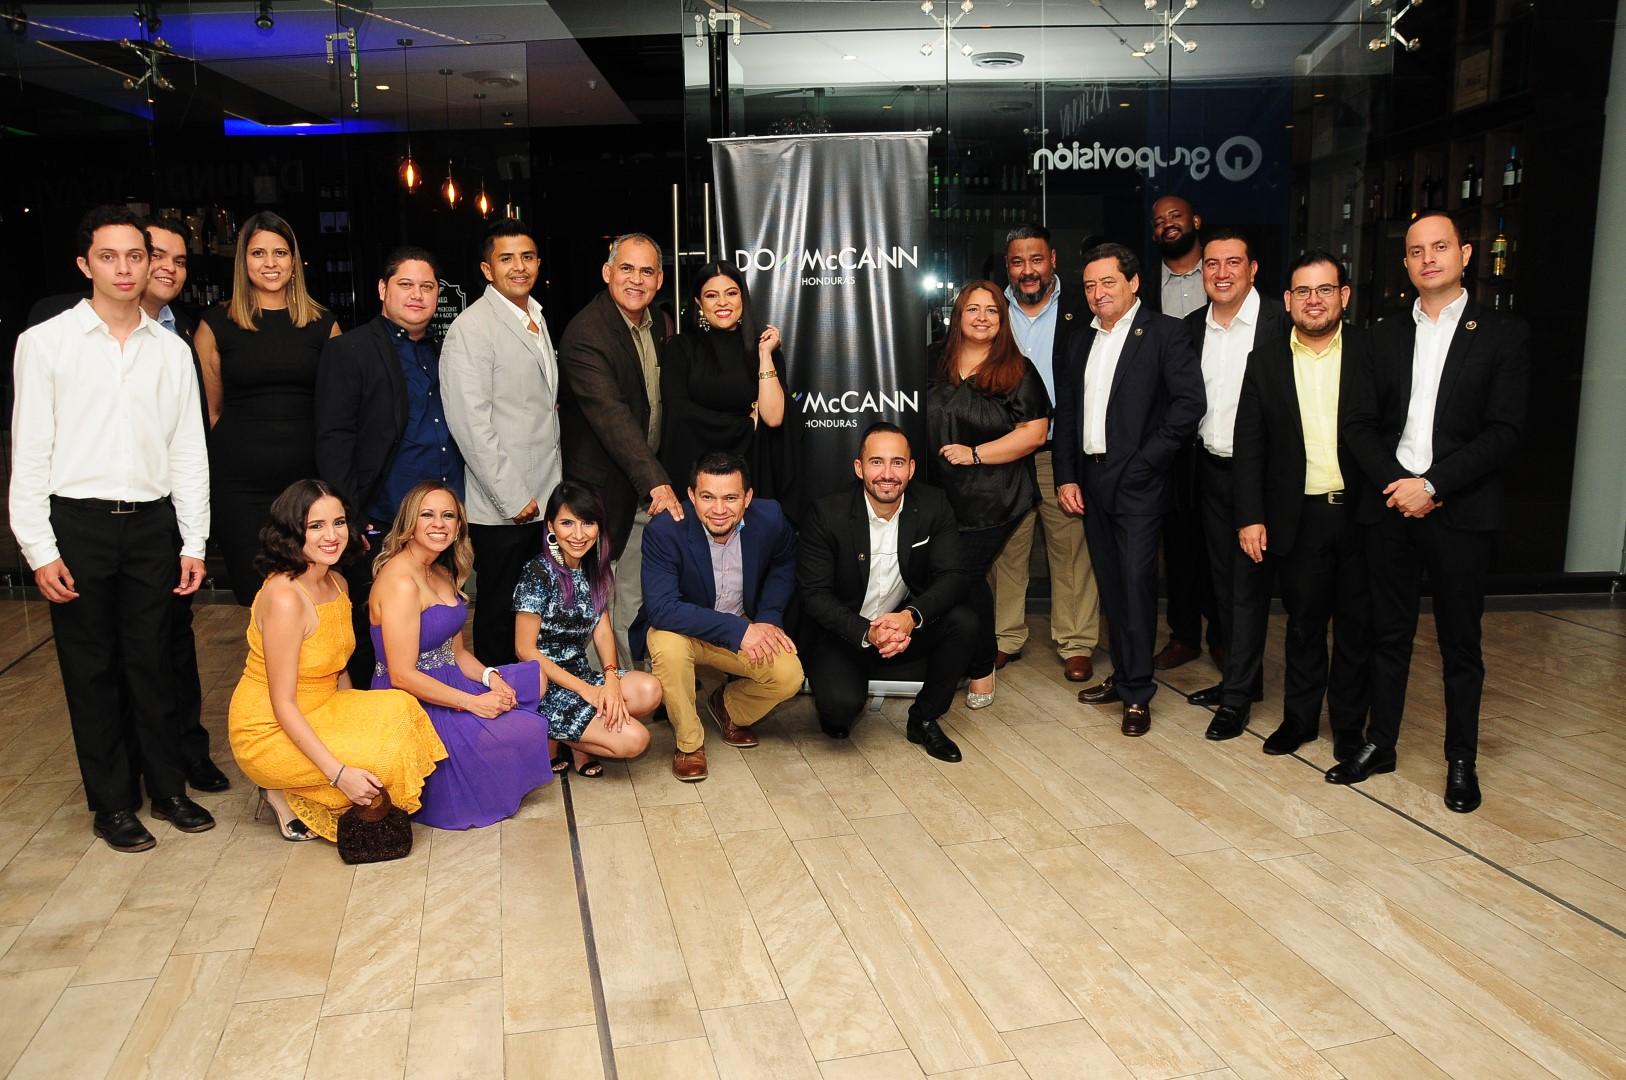 McCann Honduras lanza nueva imagen e inaugura oficinas en Tegucigalpa y San Pedro Sula